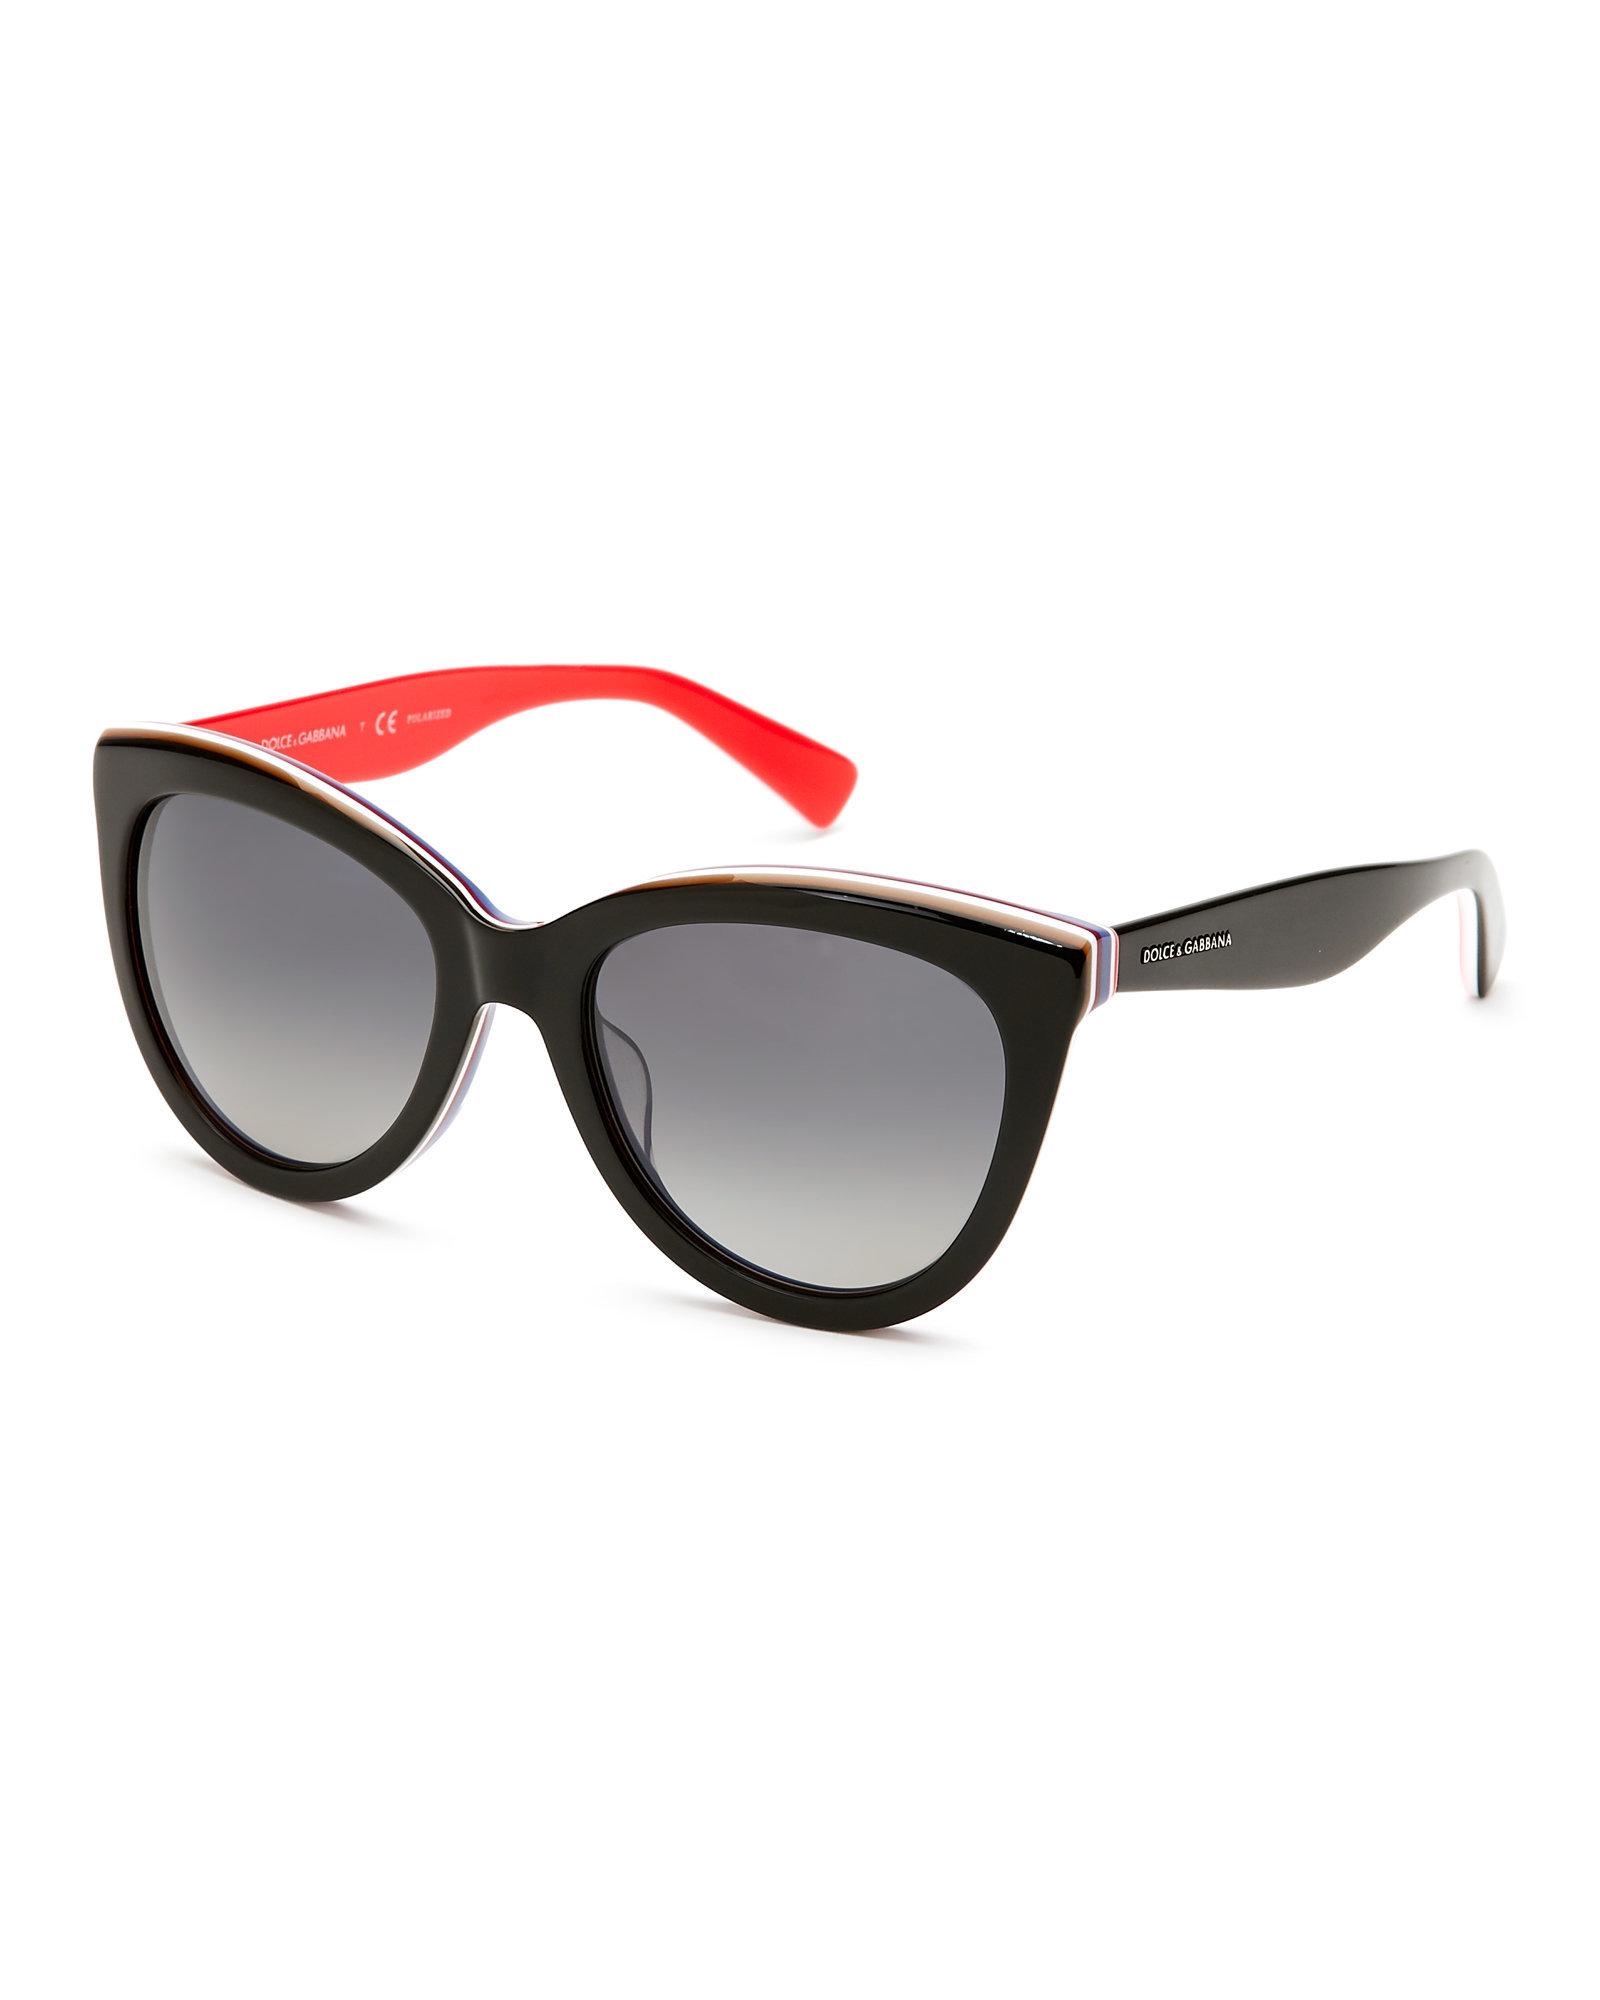 f8589fd84c5 Dolce Gabbana Cat Eye Sunglasses